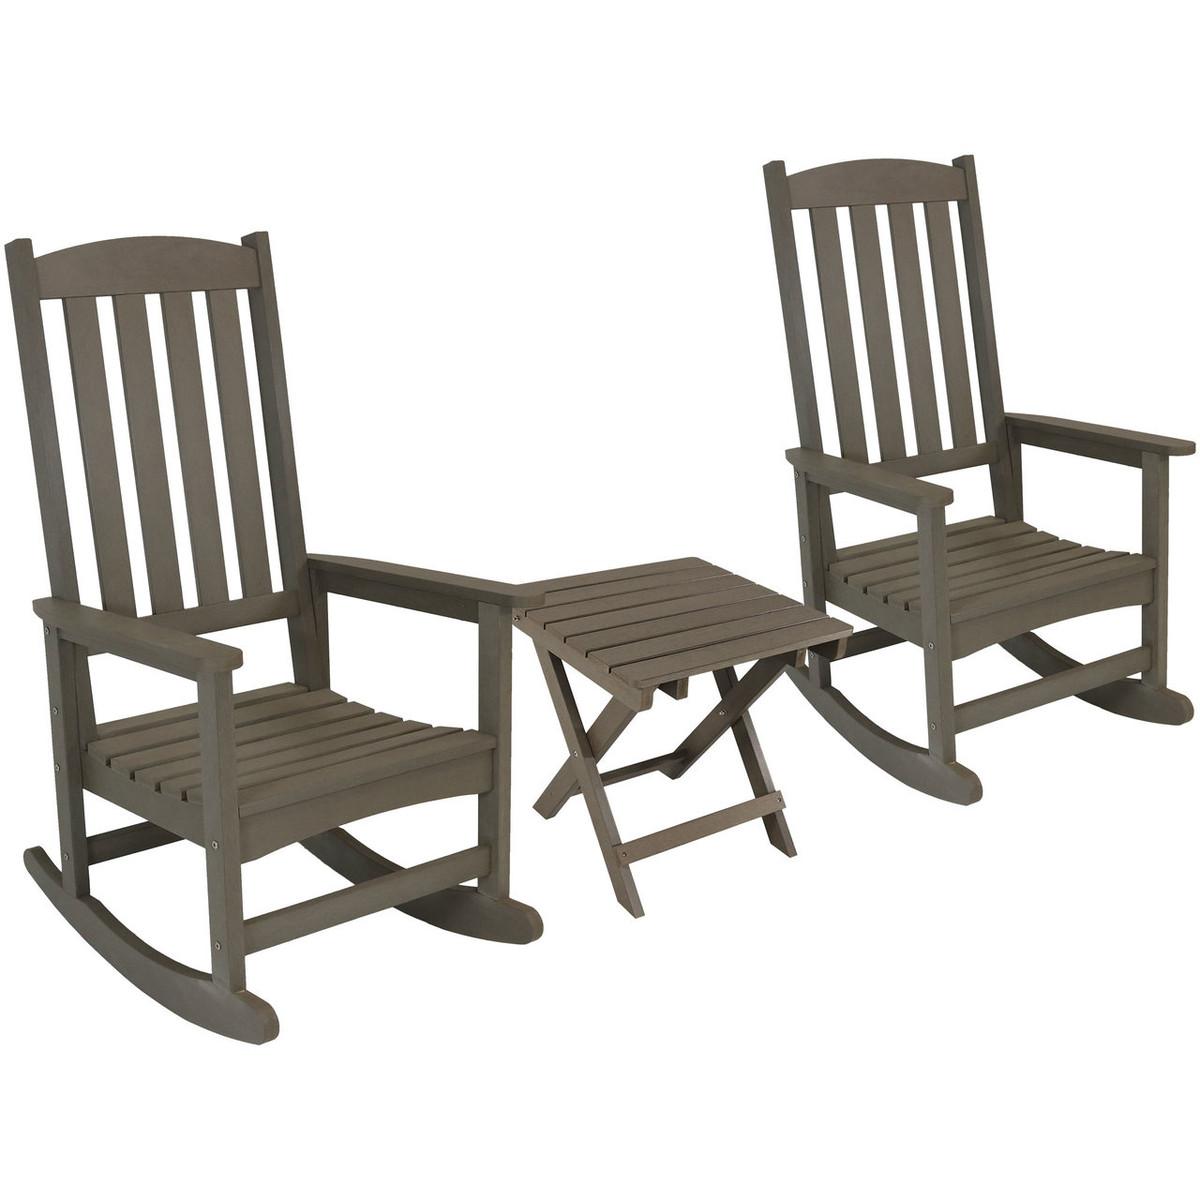 Admirable Sunnydaze Rocking Chair Patio Set Two Chairs Table Machost Co Dining Chair Design Ideas Machostcouk